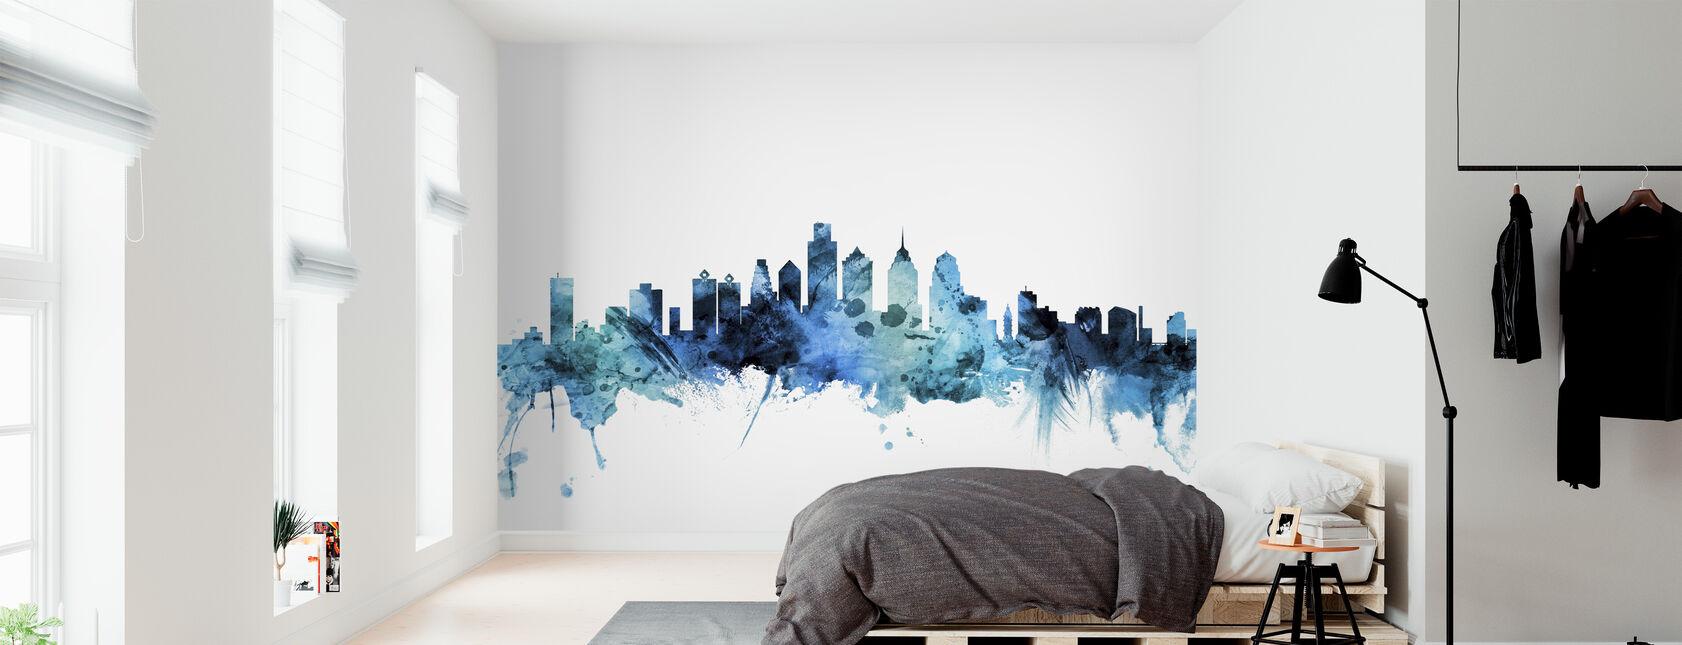 Philadelphia Pennsylvania Skyline - Wallpaper - Bedroom